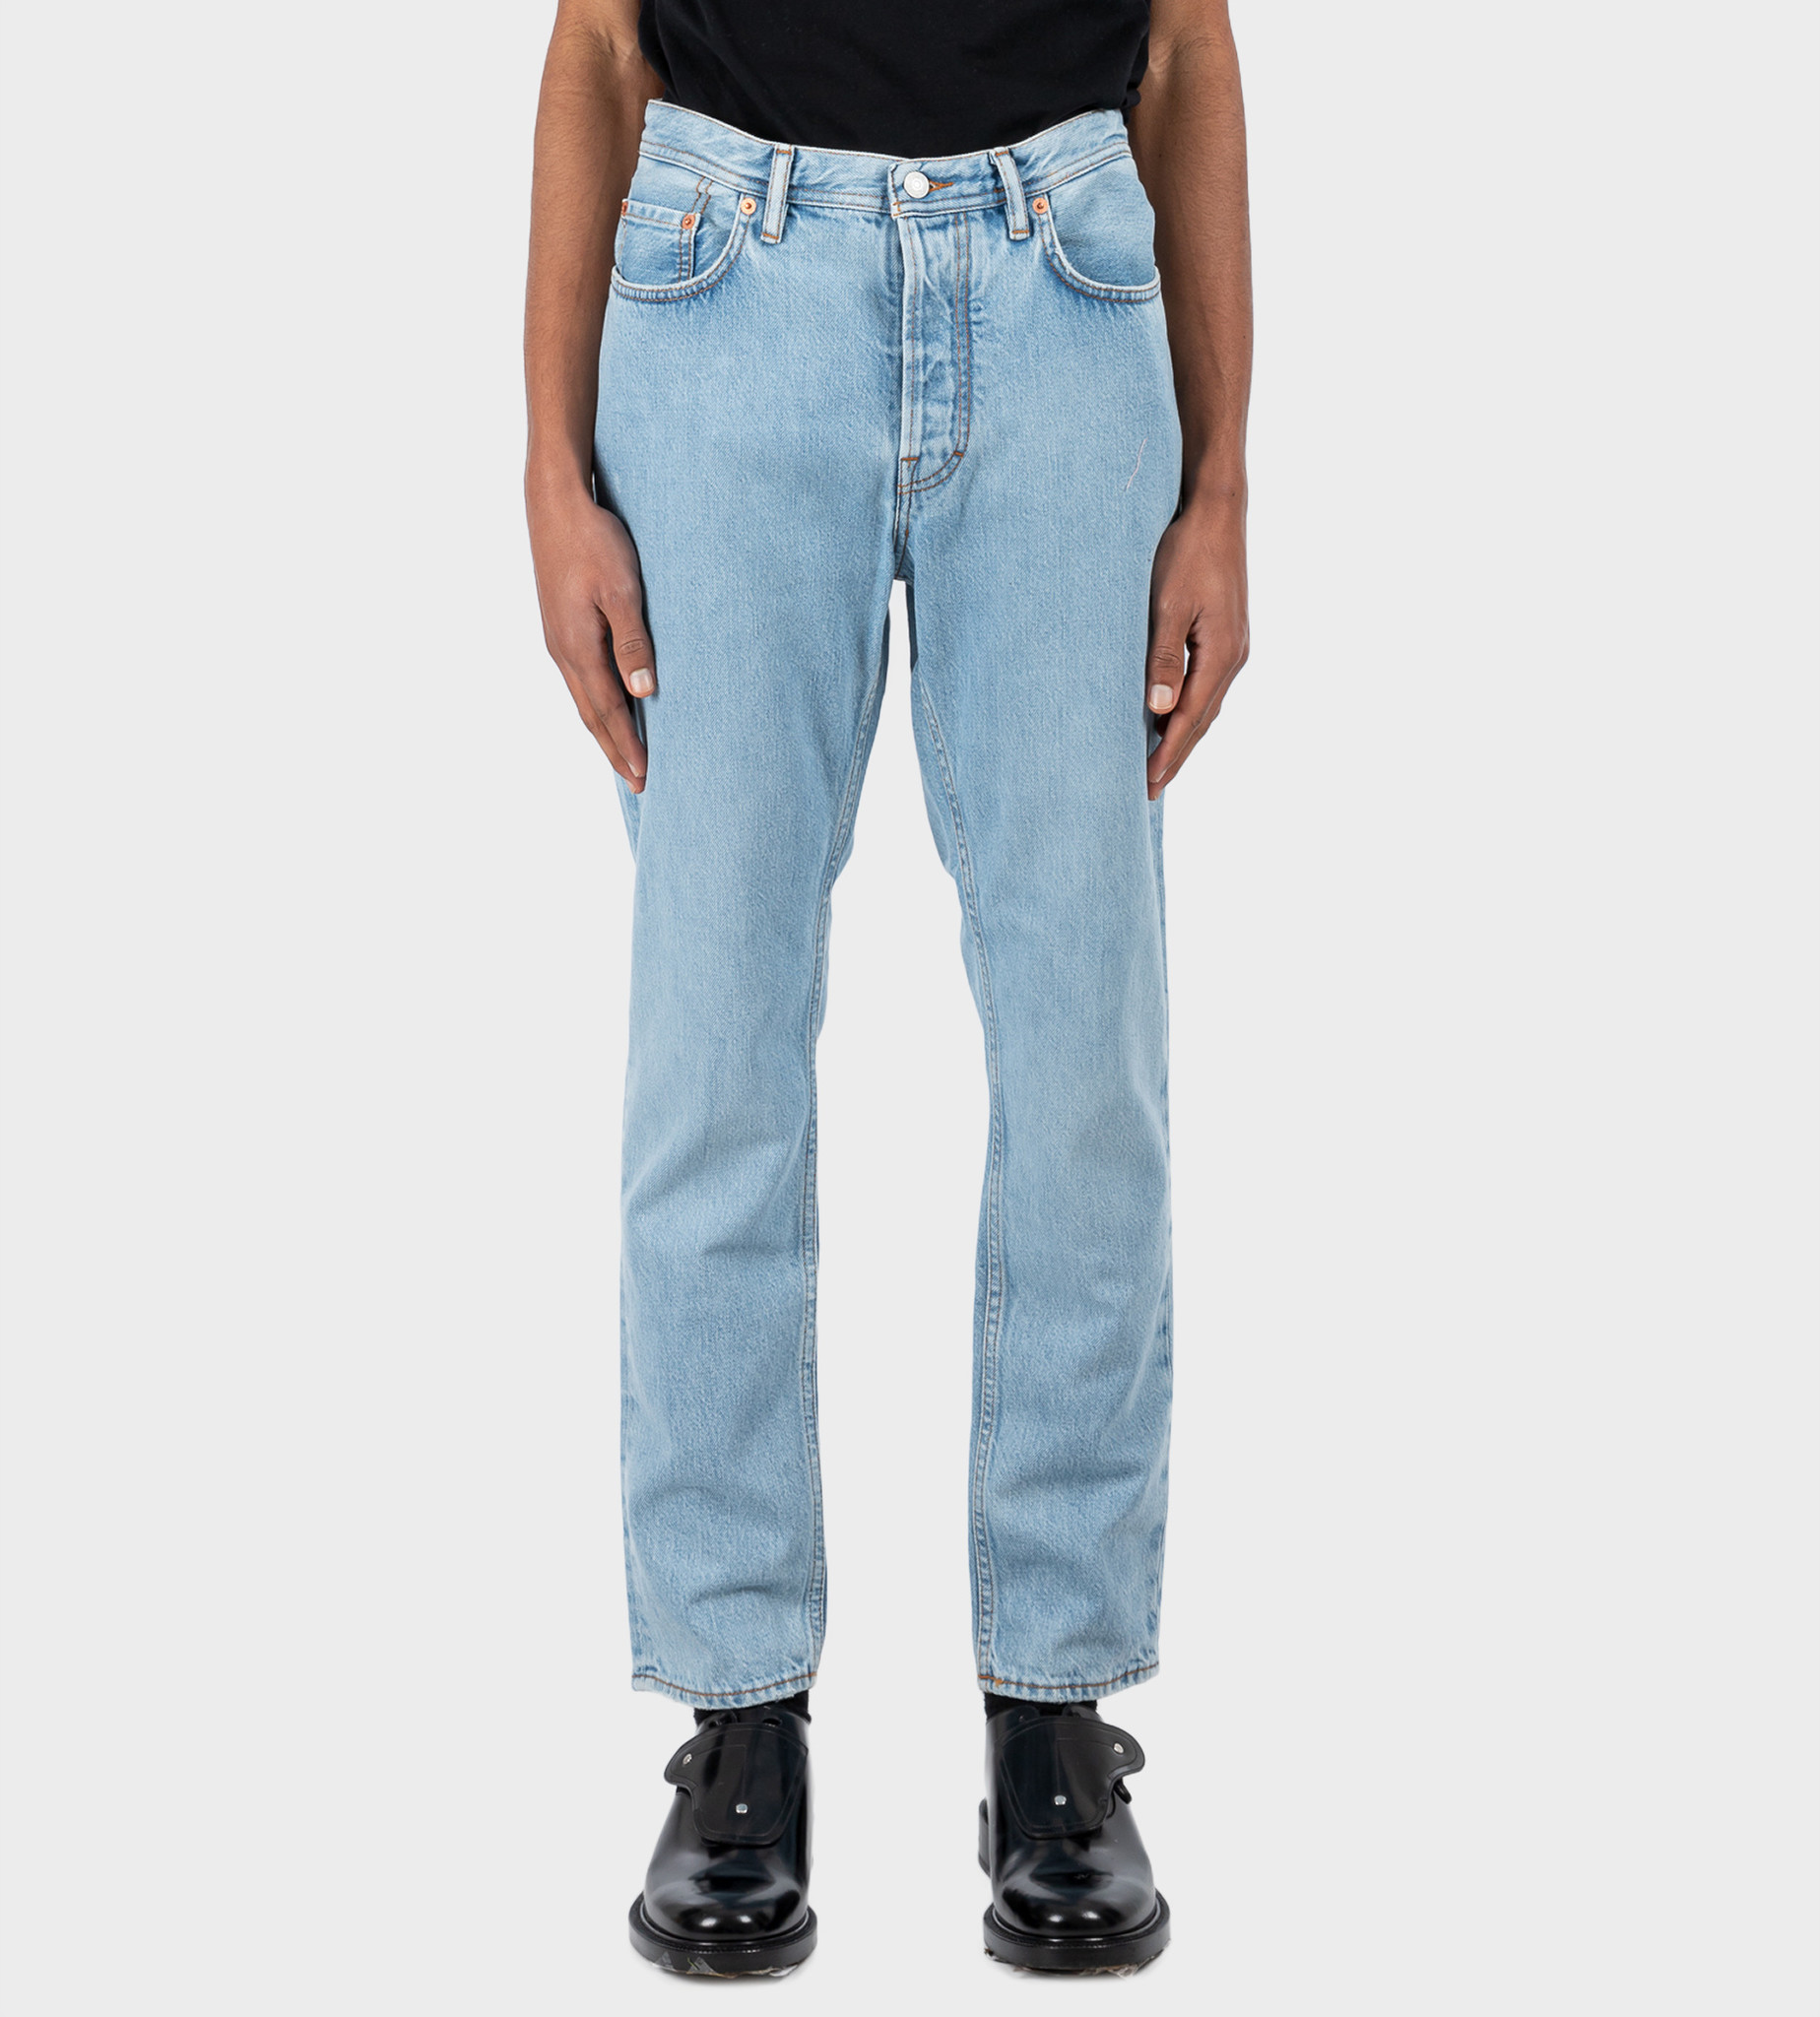 ACNE STUDIOS Slim Tapered Jeans Light Blue